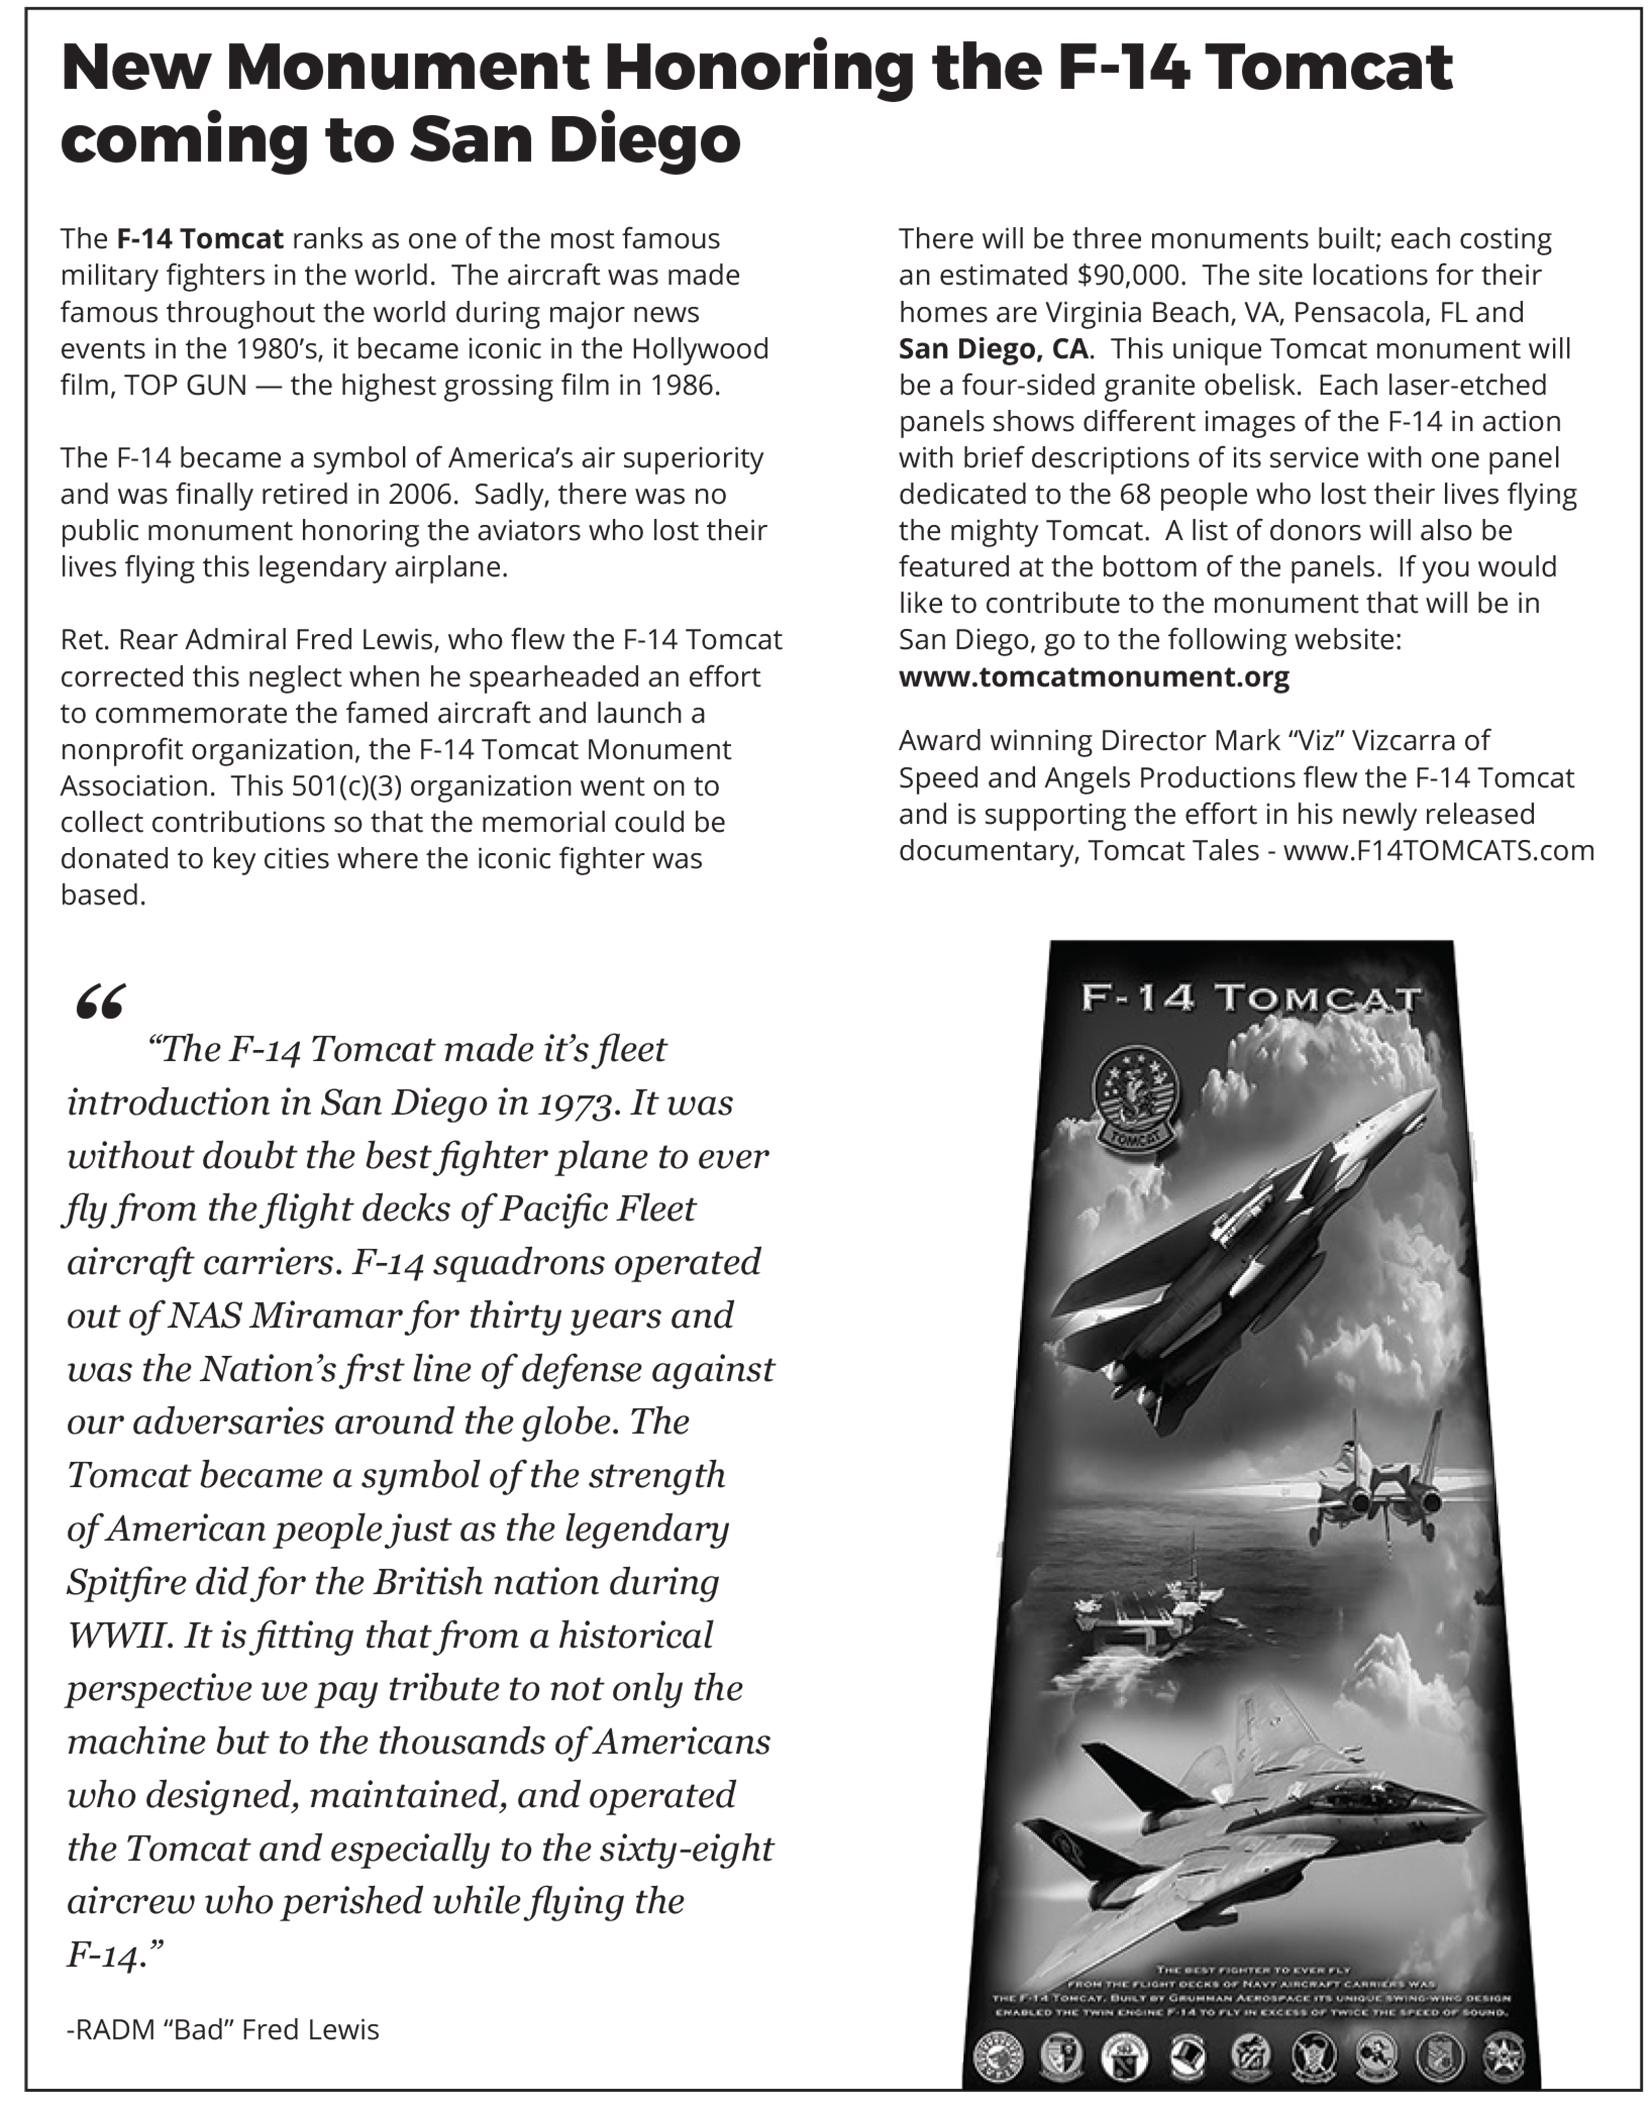 https://sandiegoveteransmagazine.com/wp-content/uploads/2020/08/13.jpg